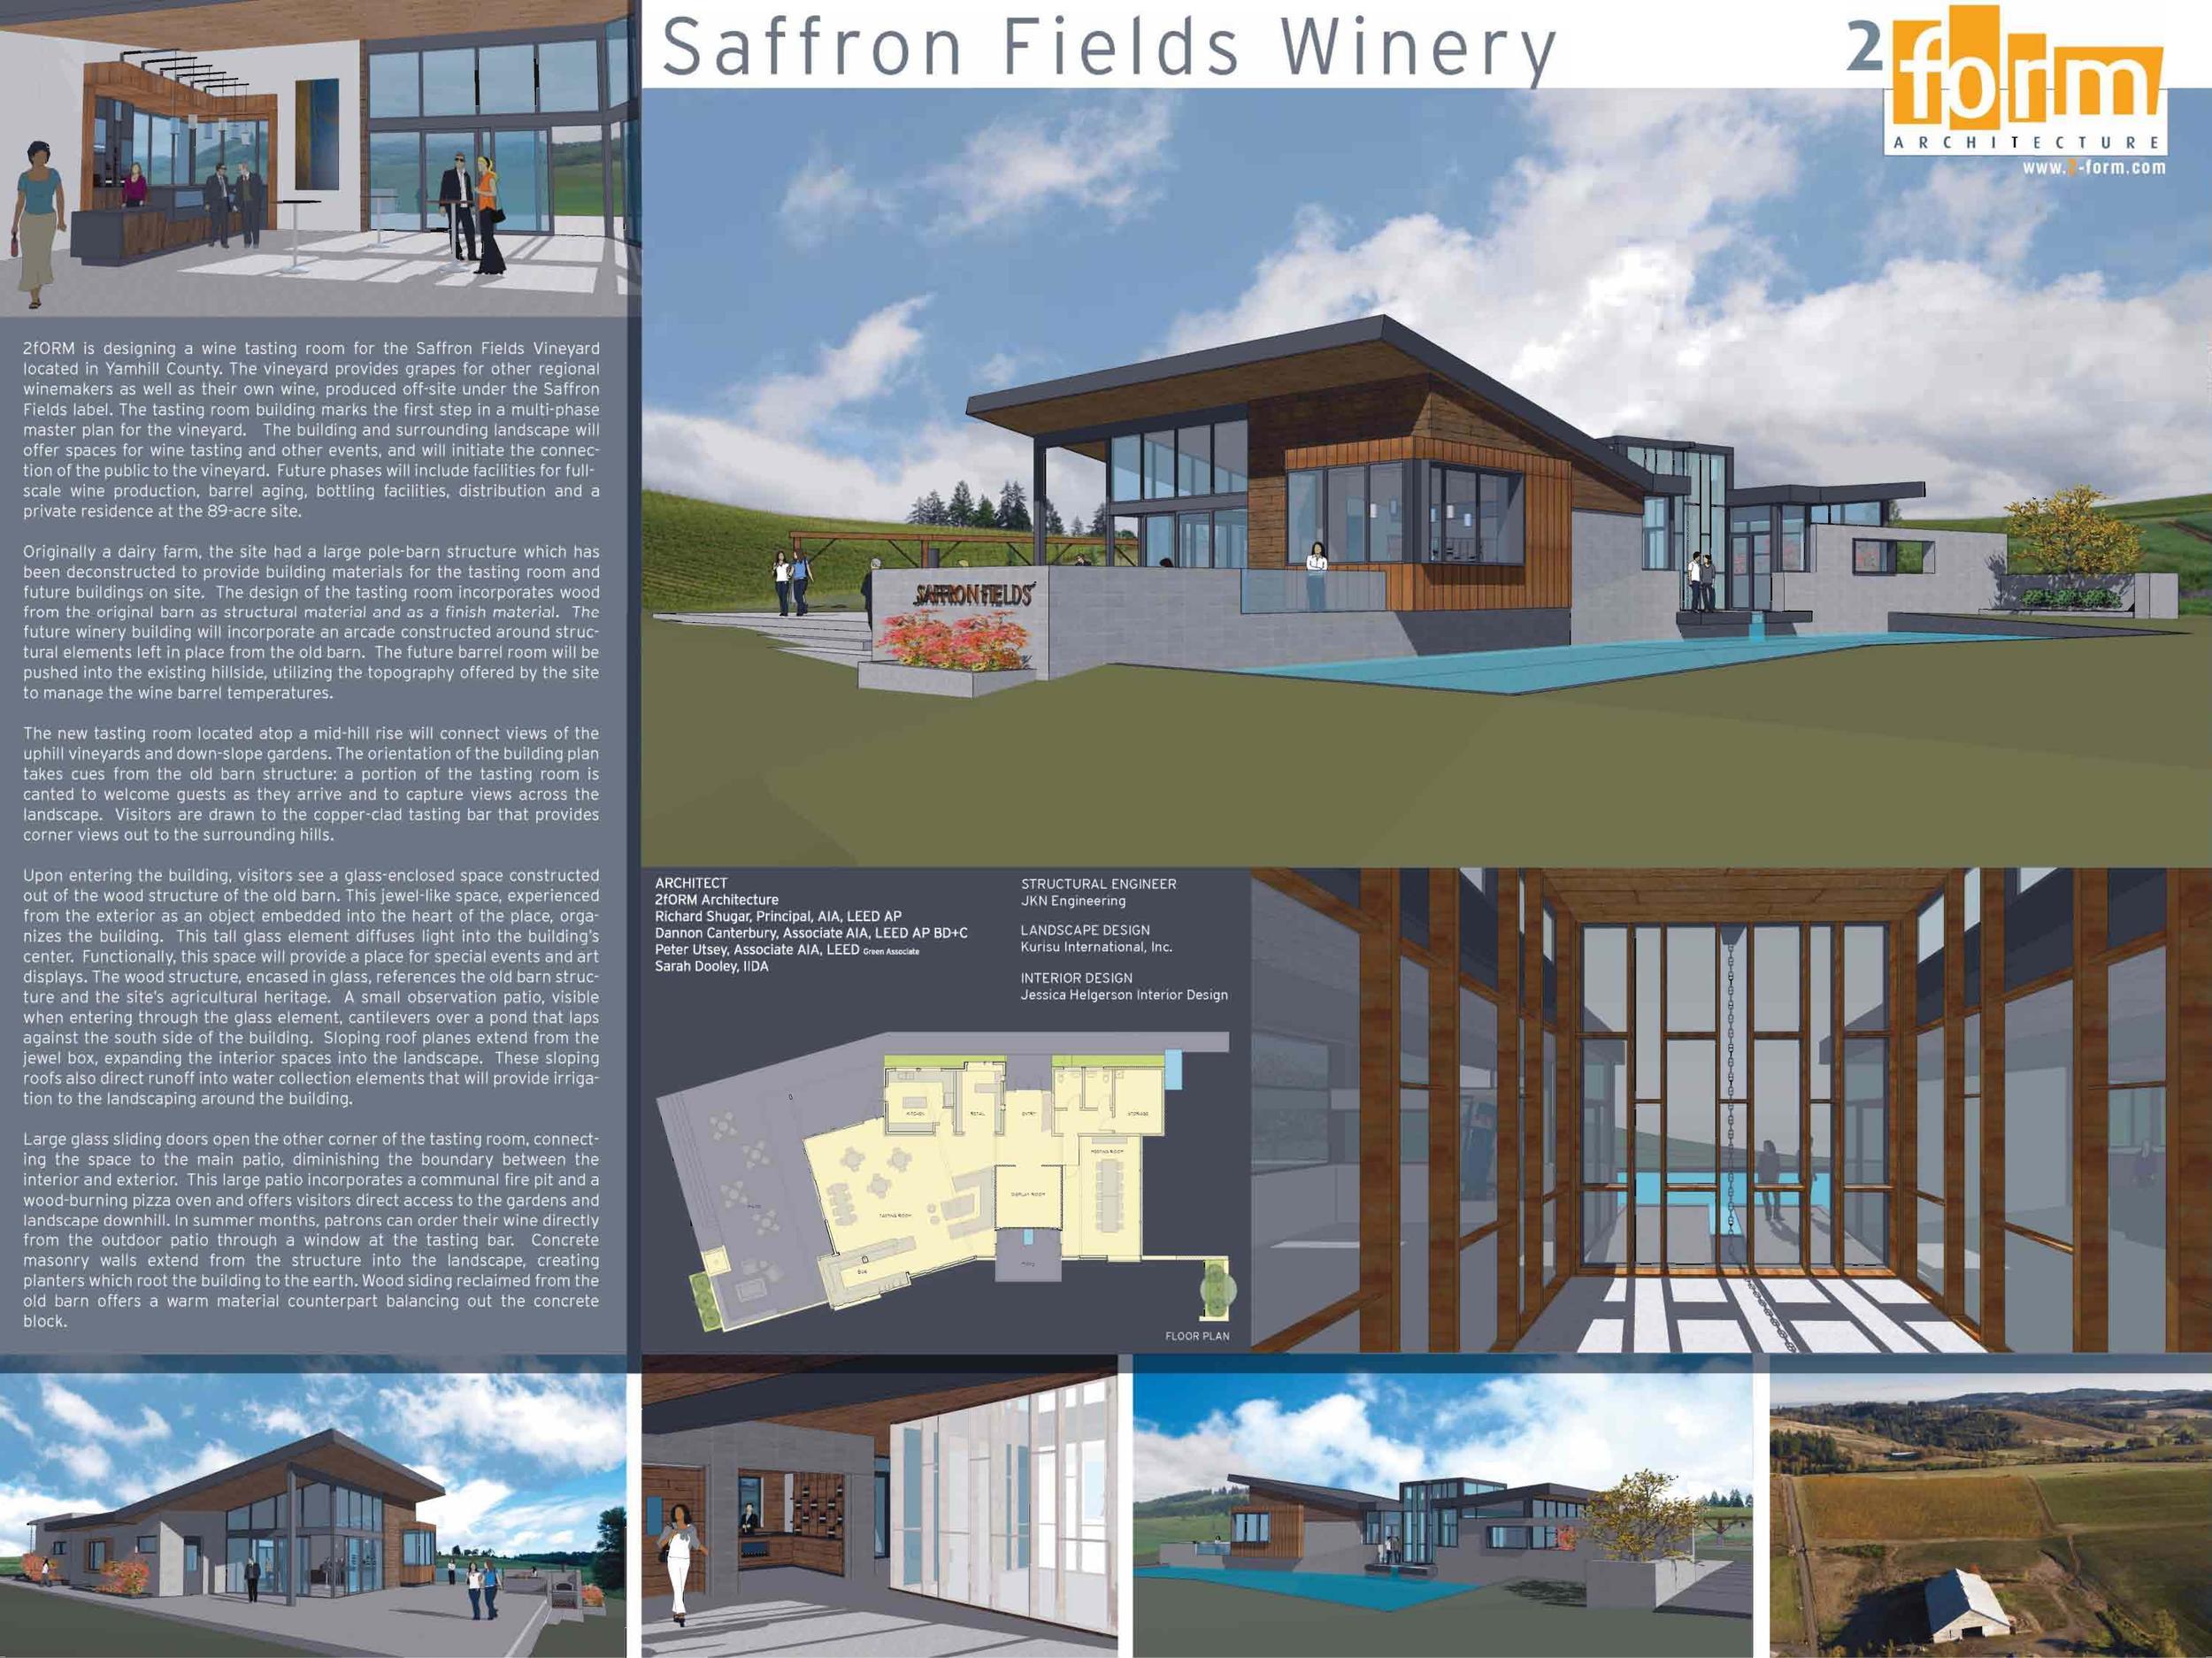 SaffronFieldsWinery Sm.jpg